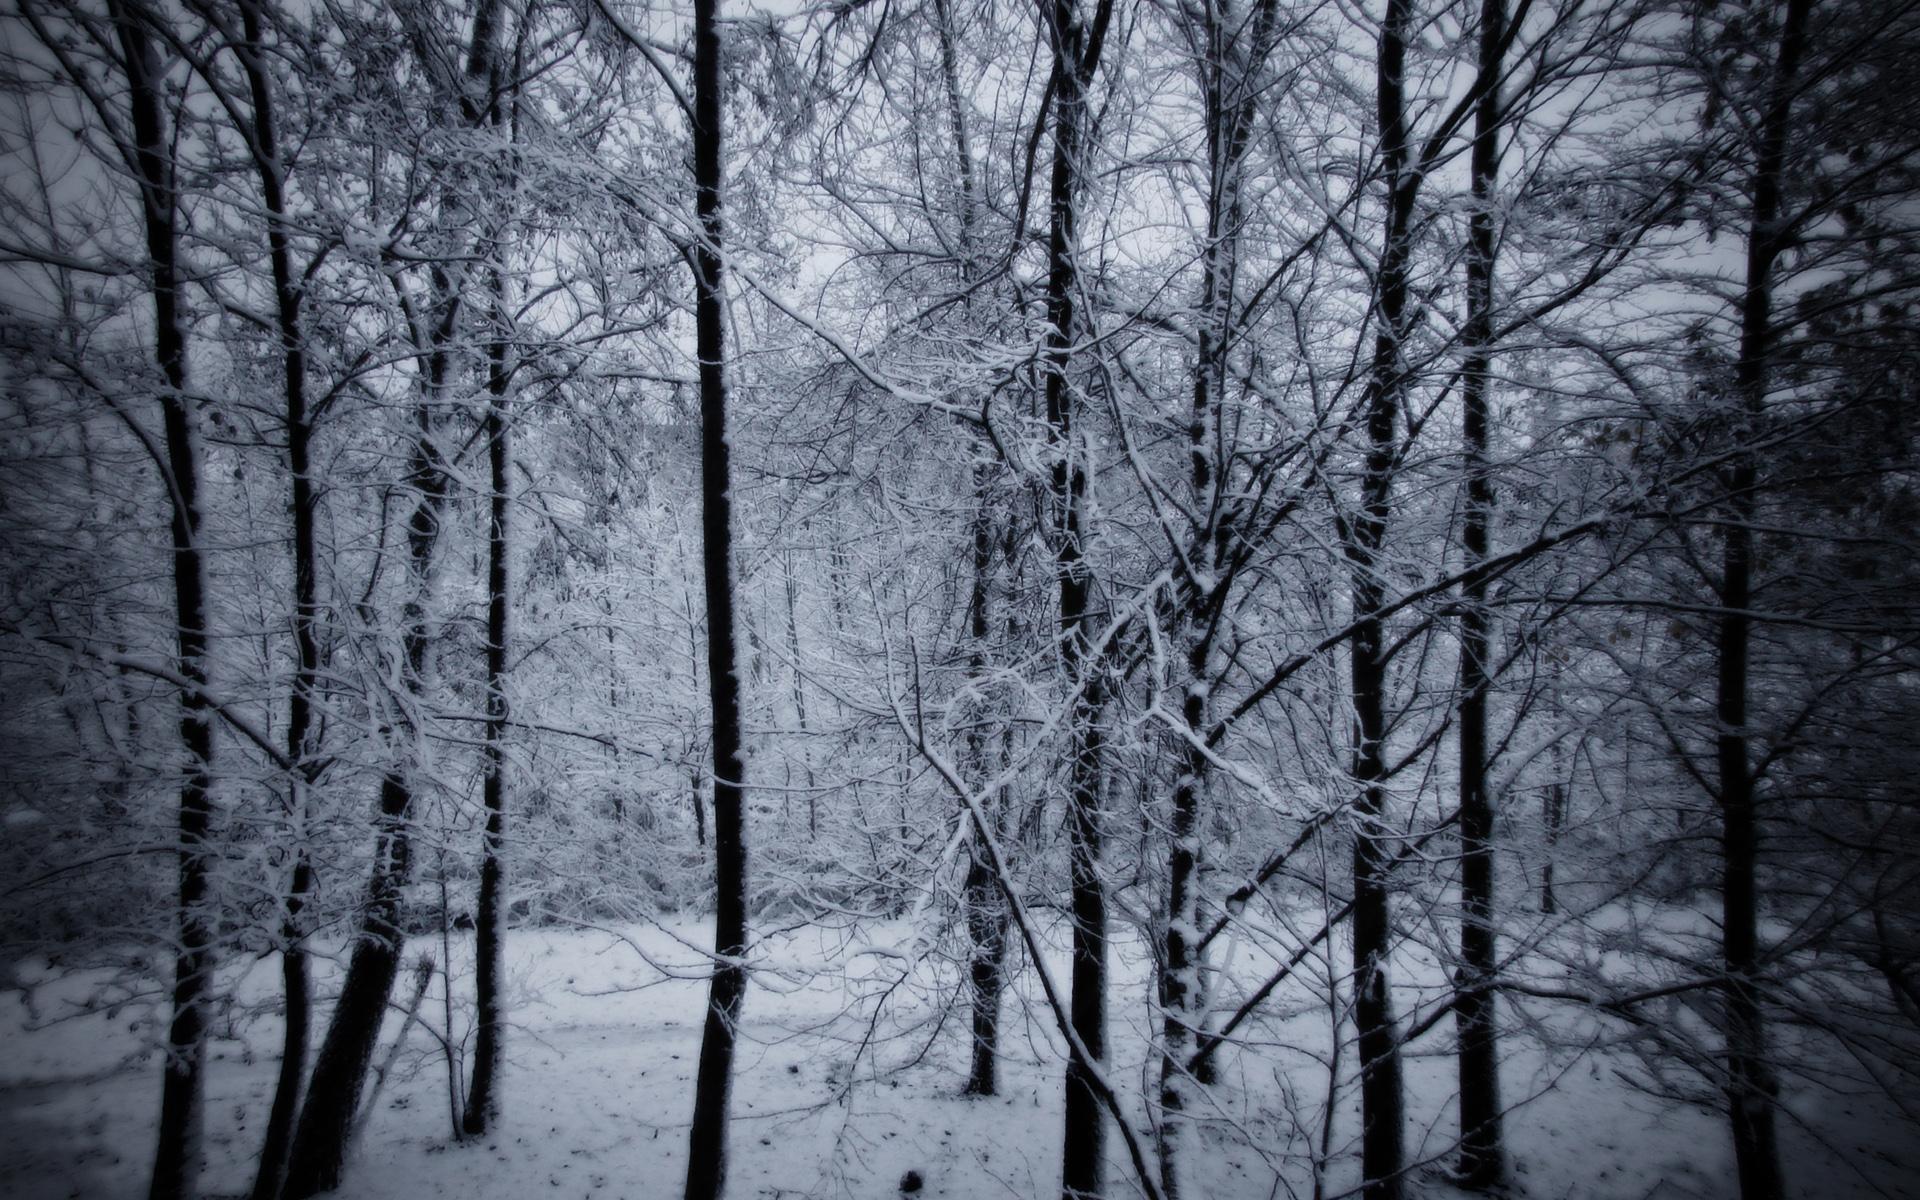 Snowy Forest Desktop Background Wallpaper 1920x1200